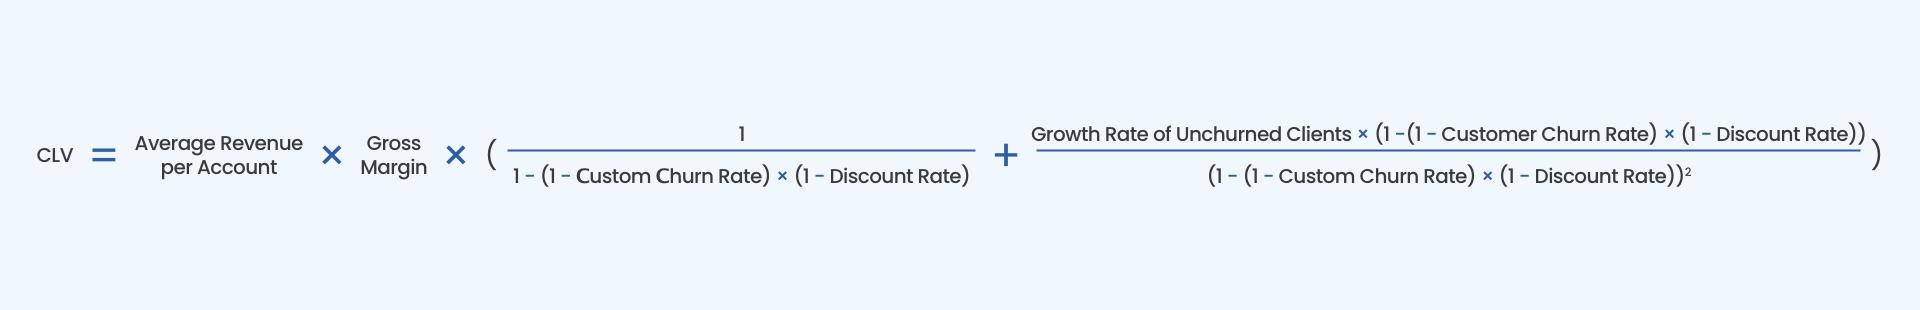 CLV formula - Customer Lifetime Value